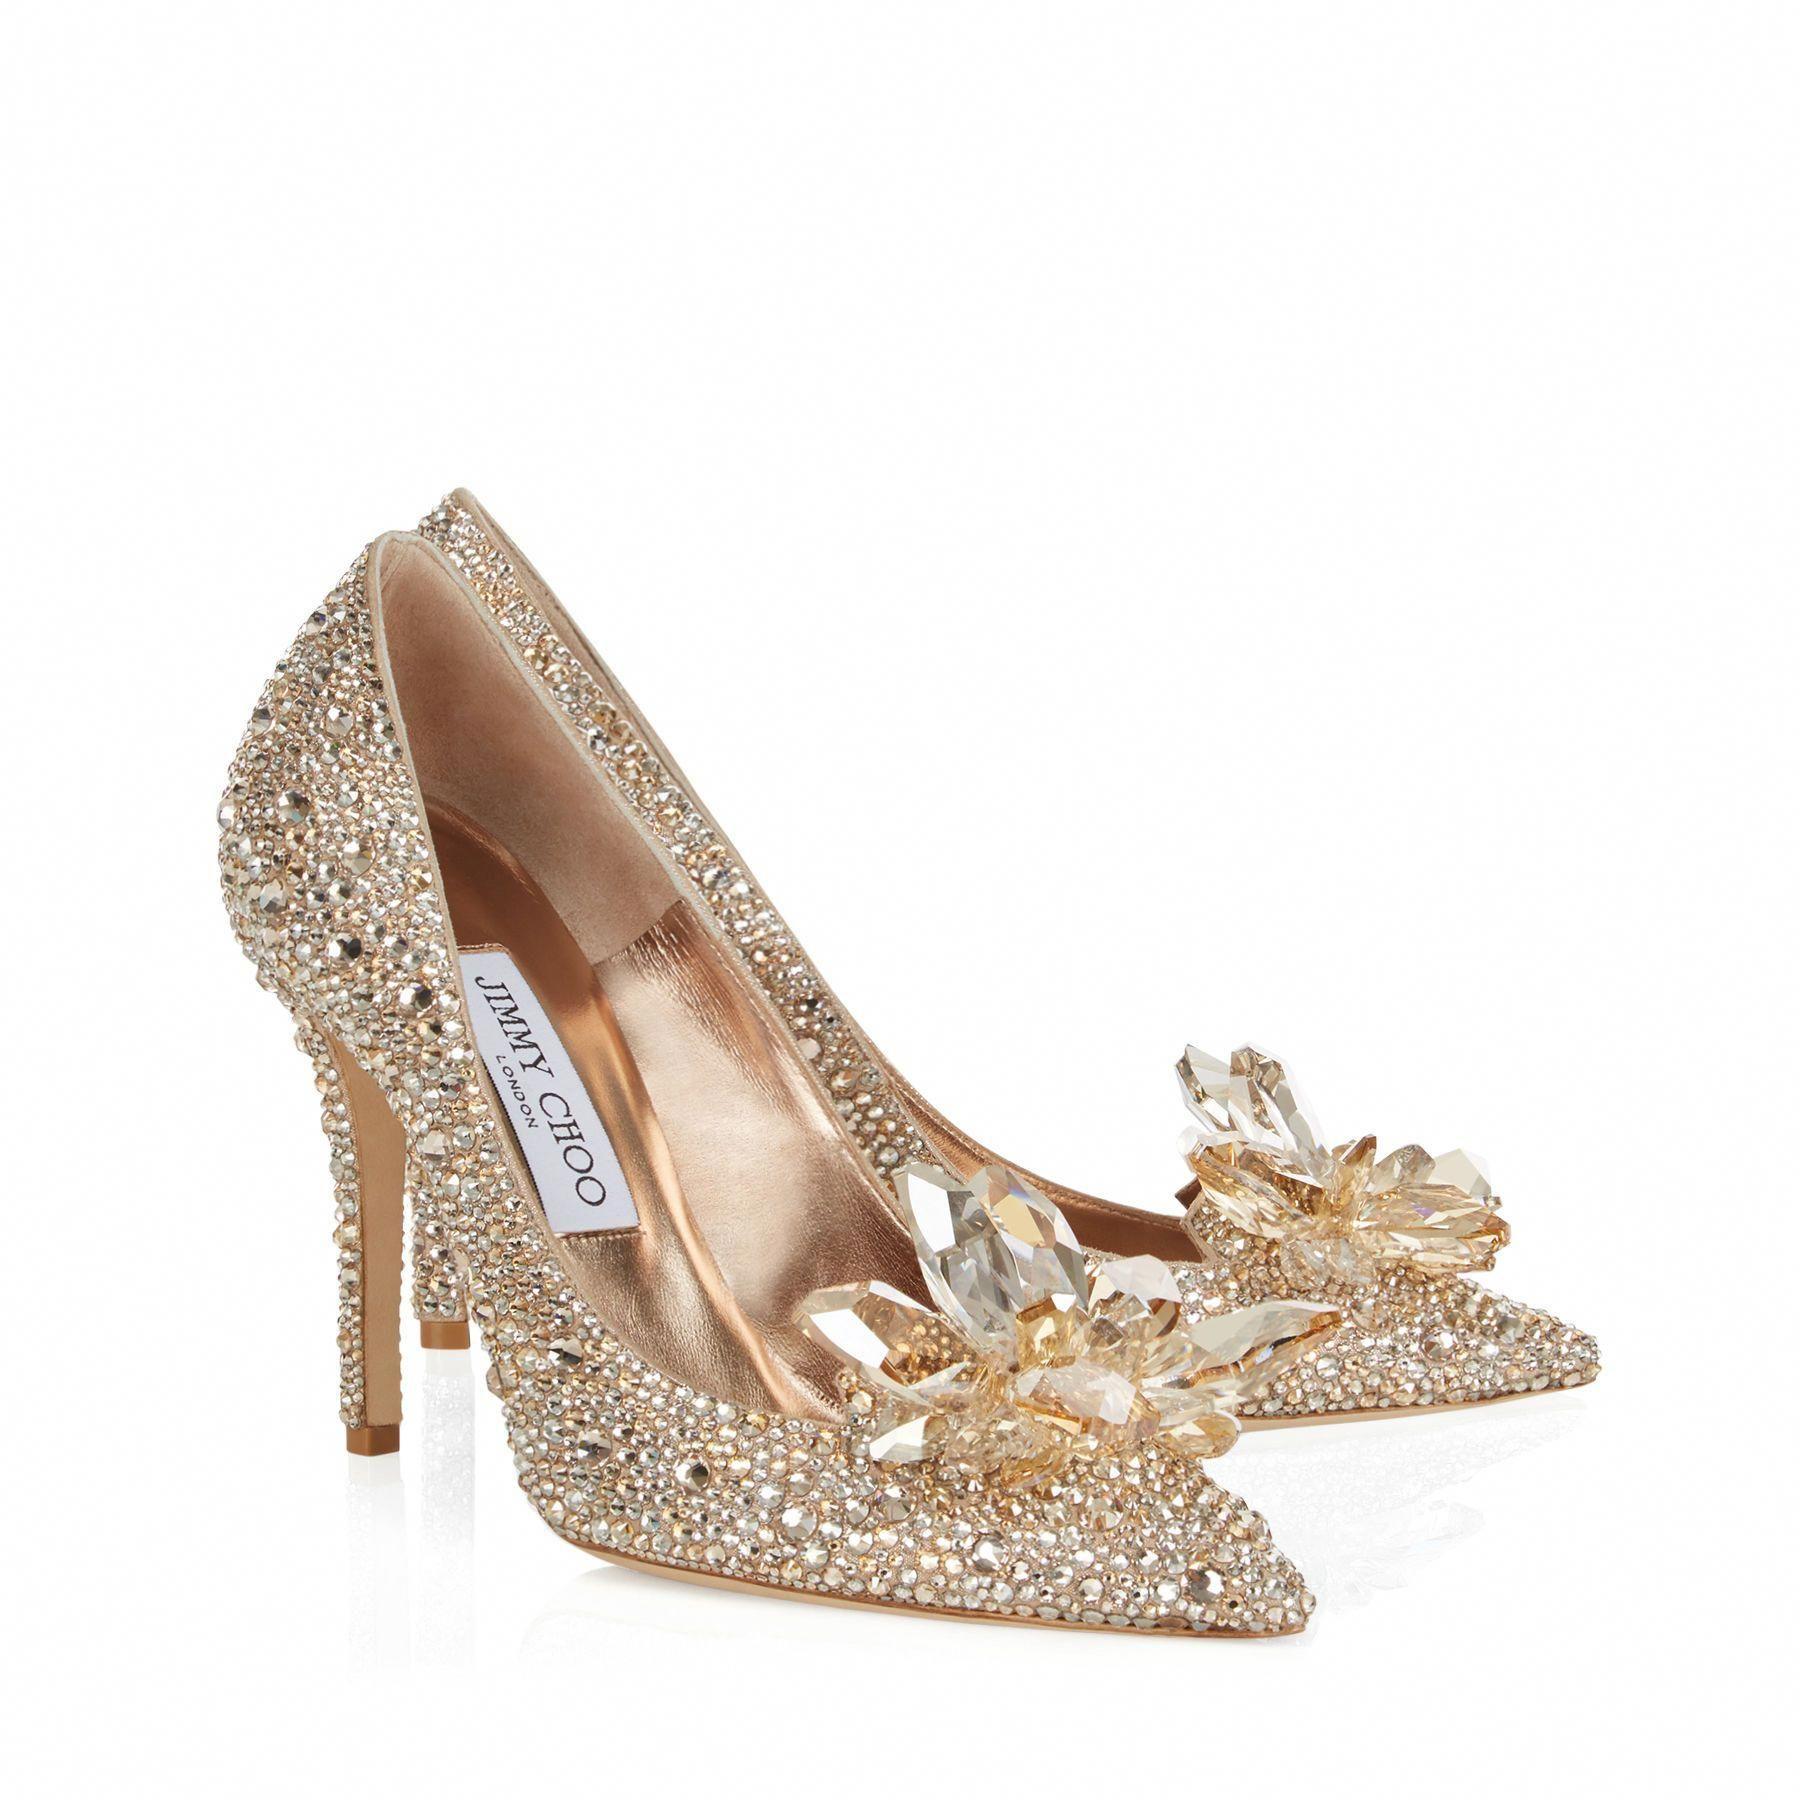 Onemix Women S Shoes Review Gwizwomensshoes Product Id 4670865677 In 2020 Jimmy Choo Heels Jimmy Choo Bag Jimmy Choo